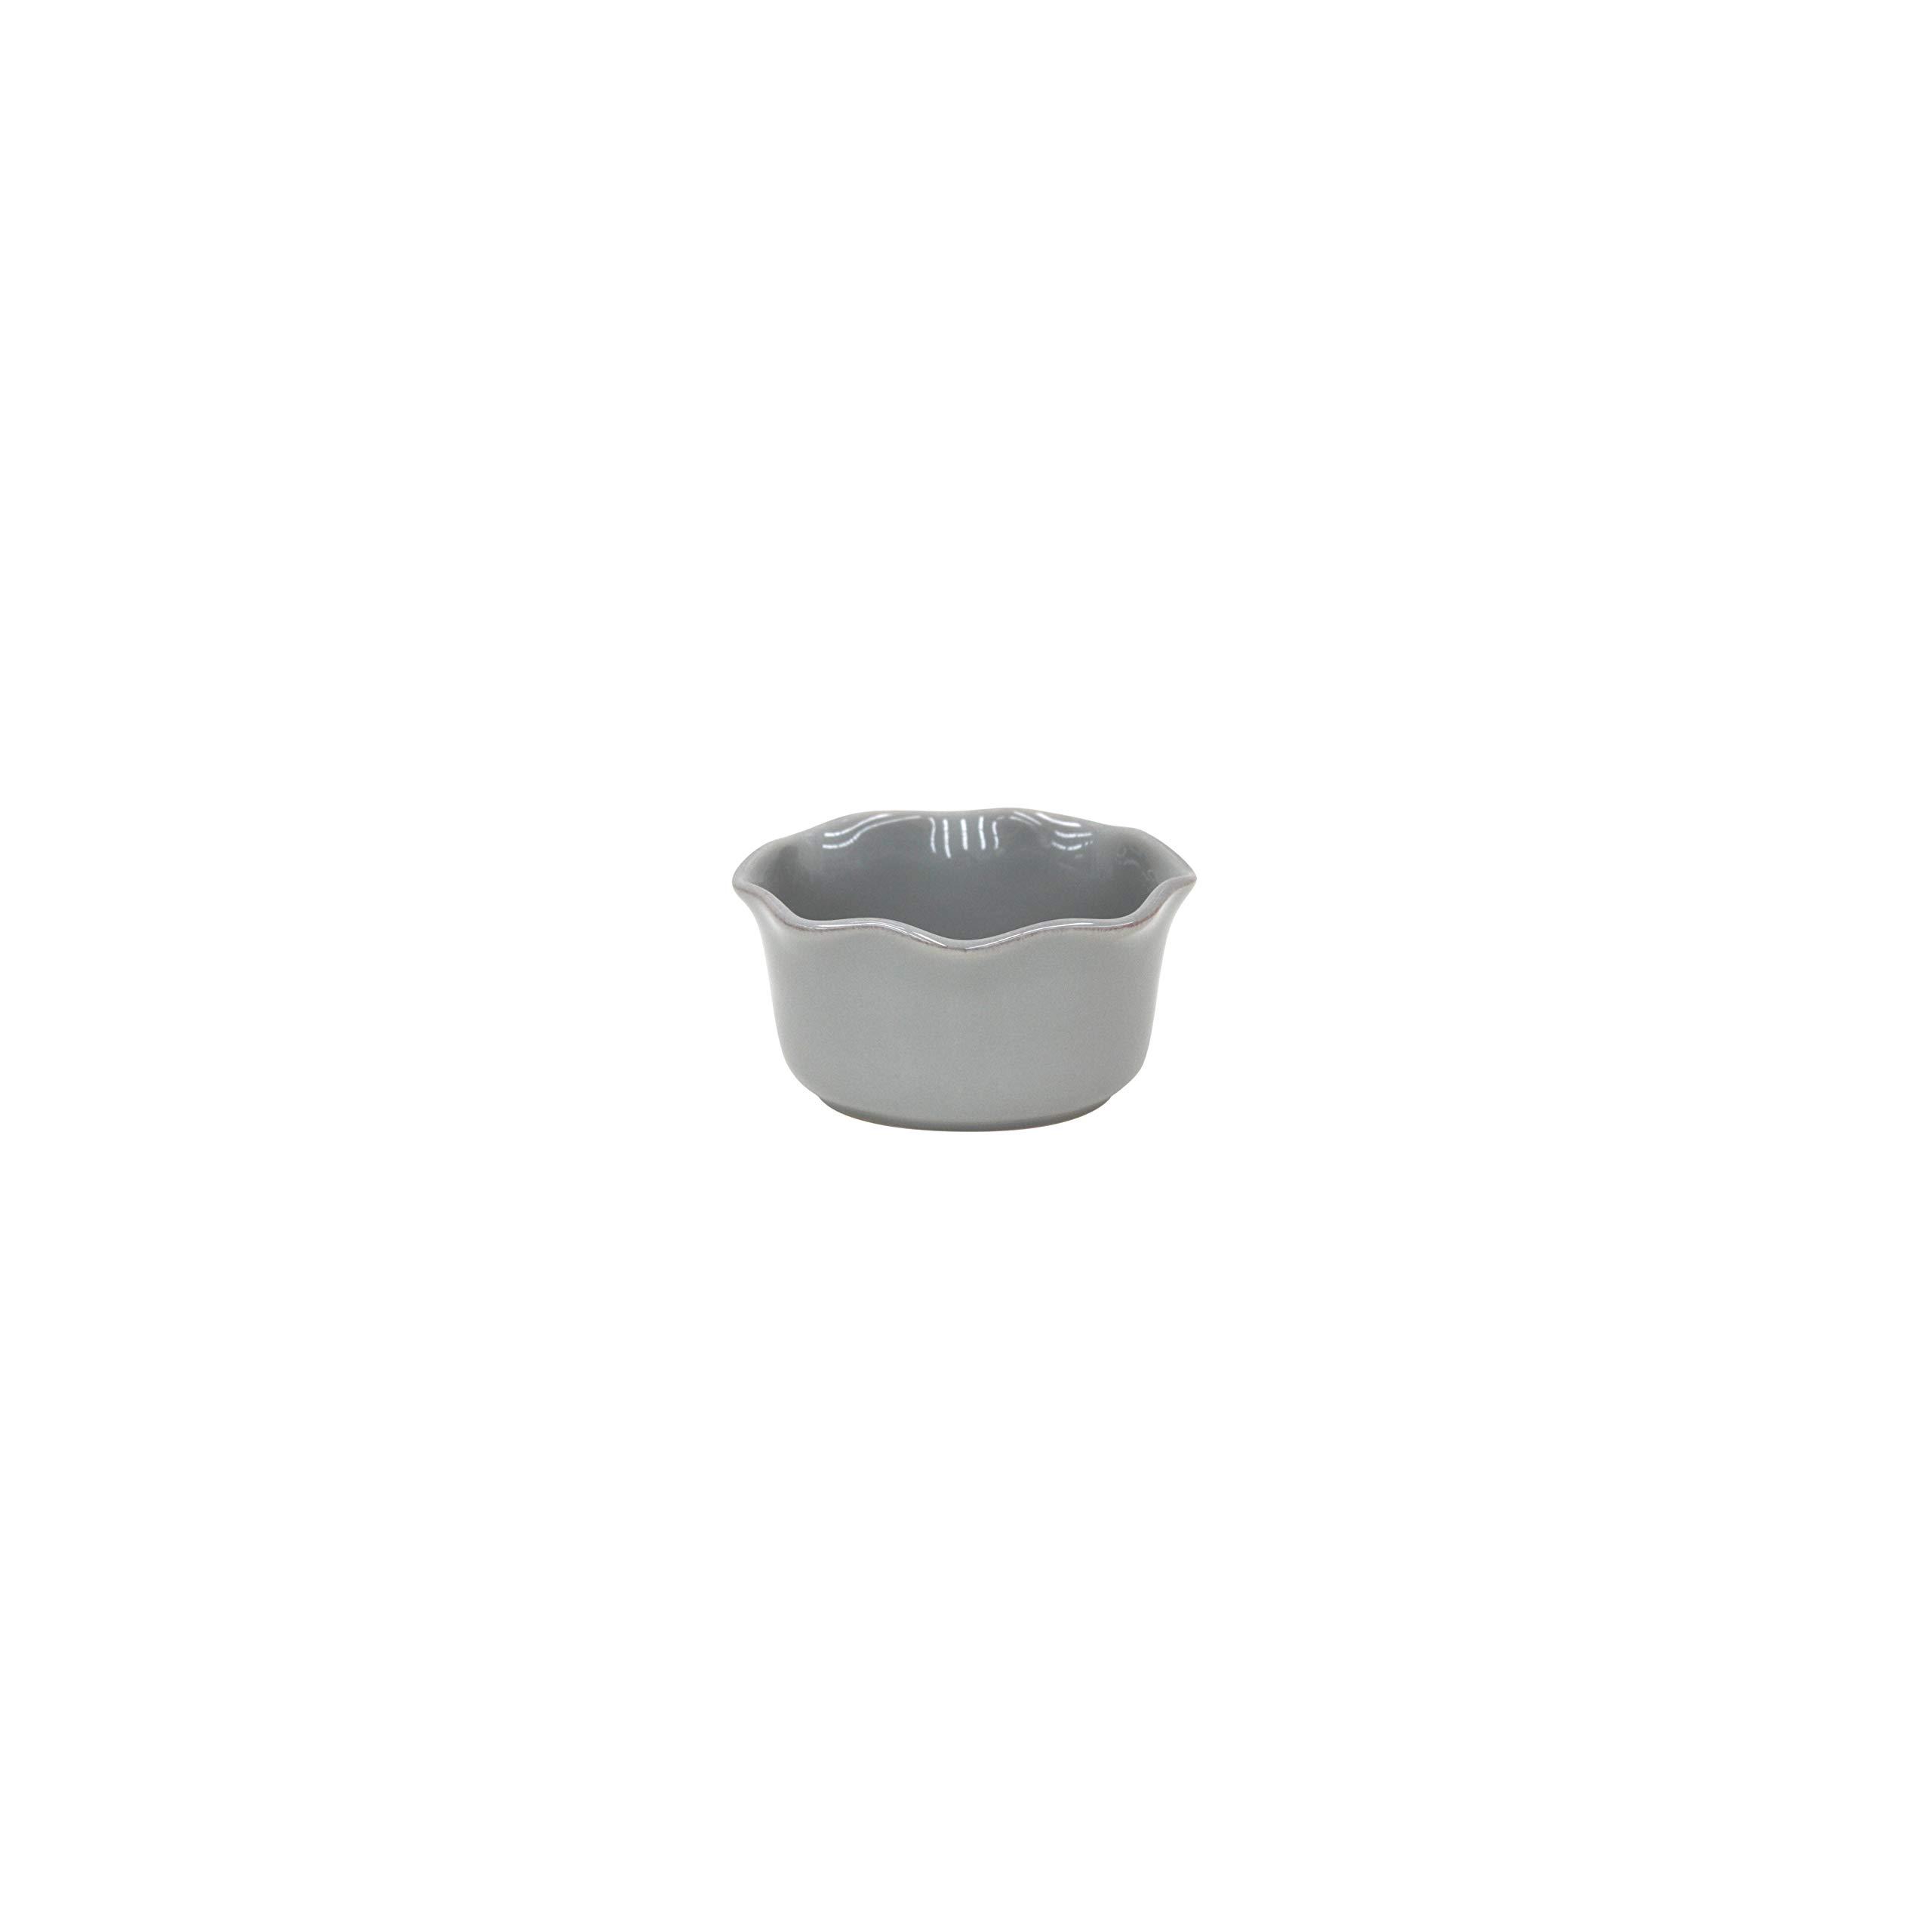 Casafina Cook & Host Collection Stoneware Ceramic Ruffled Ramekin 4.5'' (Set 4), Grey by Casafina (Image #1)